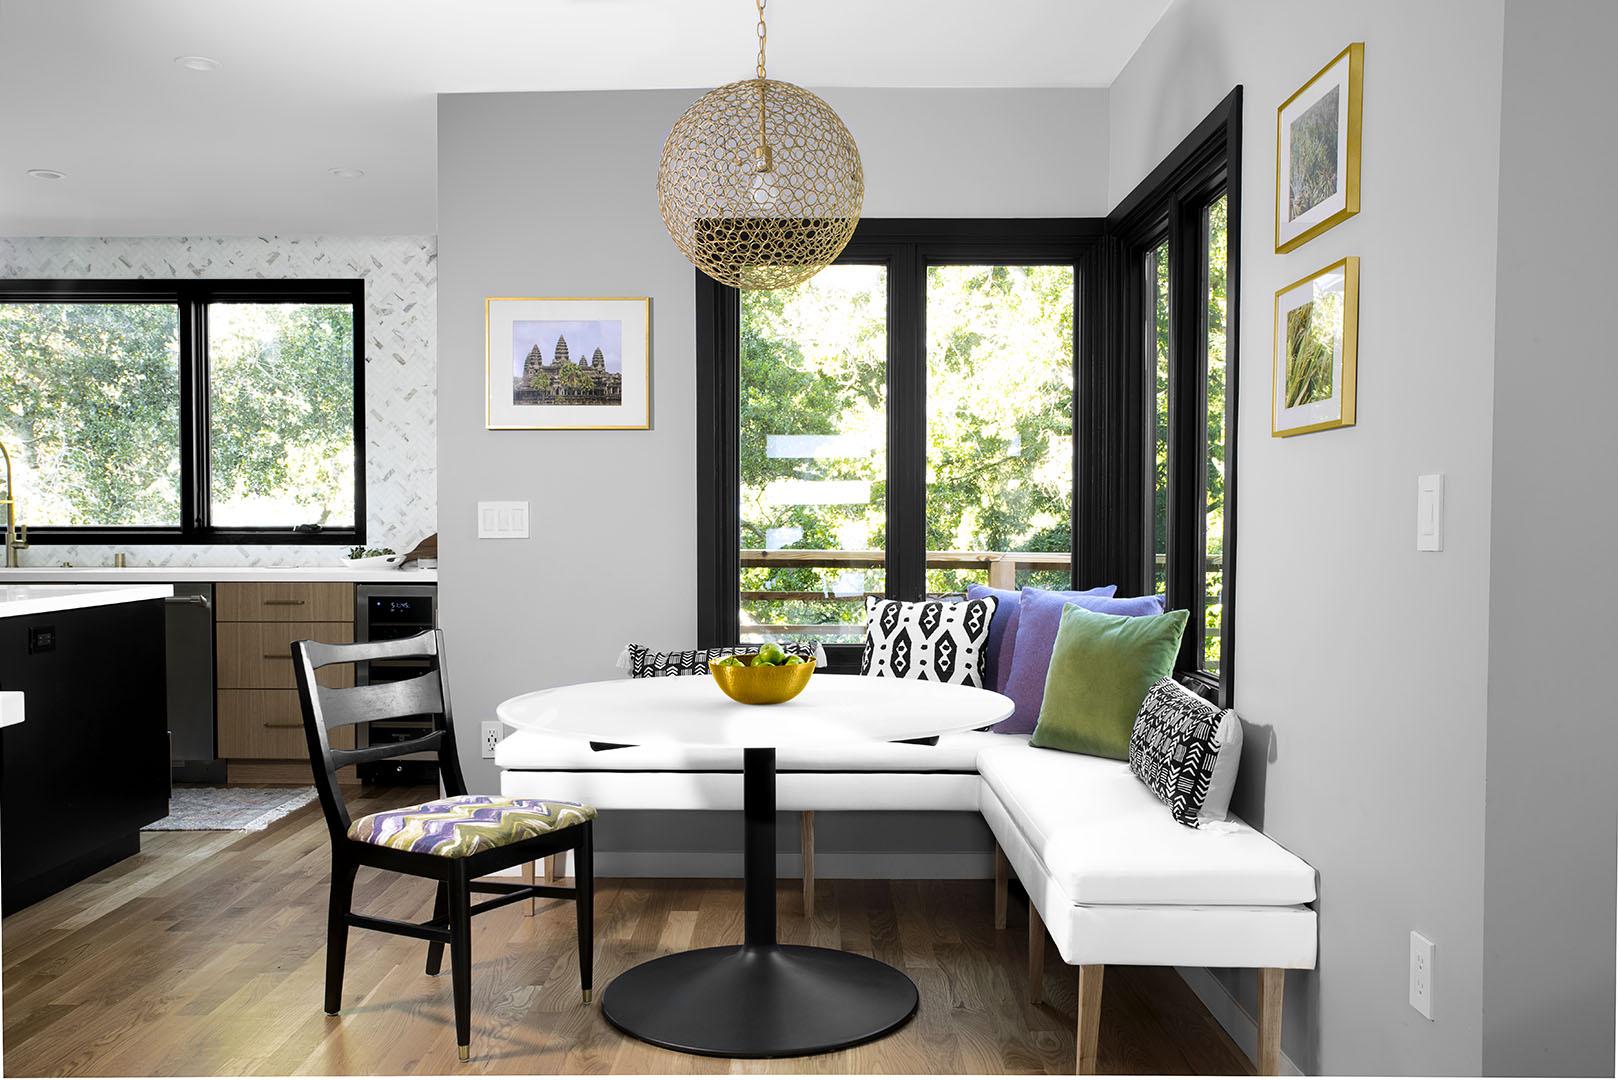 Dining area interior design Oakland, CA